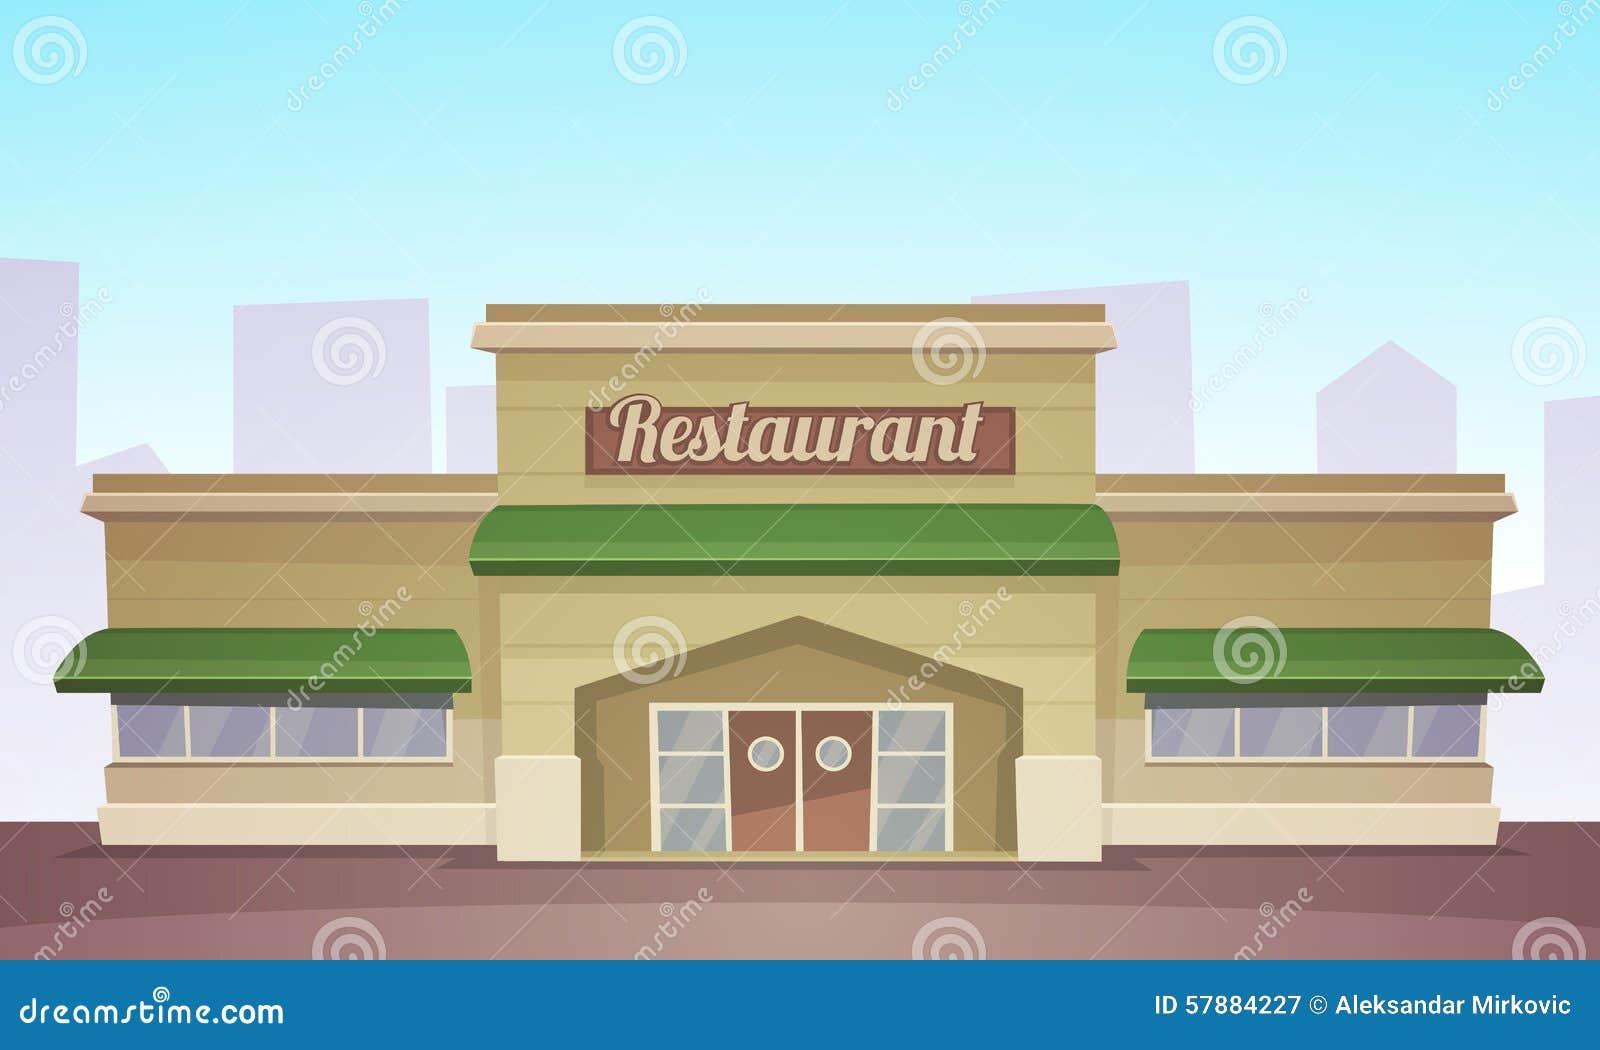 Cartoon restaurant free vector graphic download - Royalty Free Vector Building Cartoon Illustration Restaurant